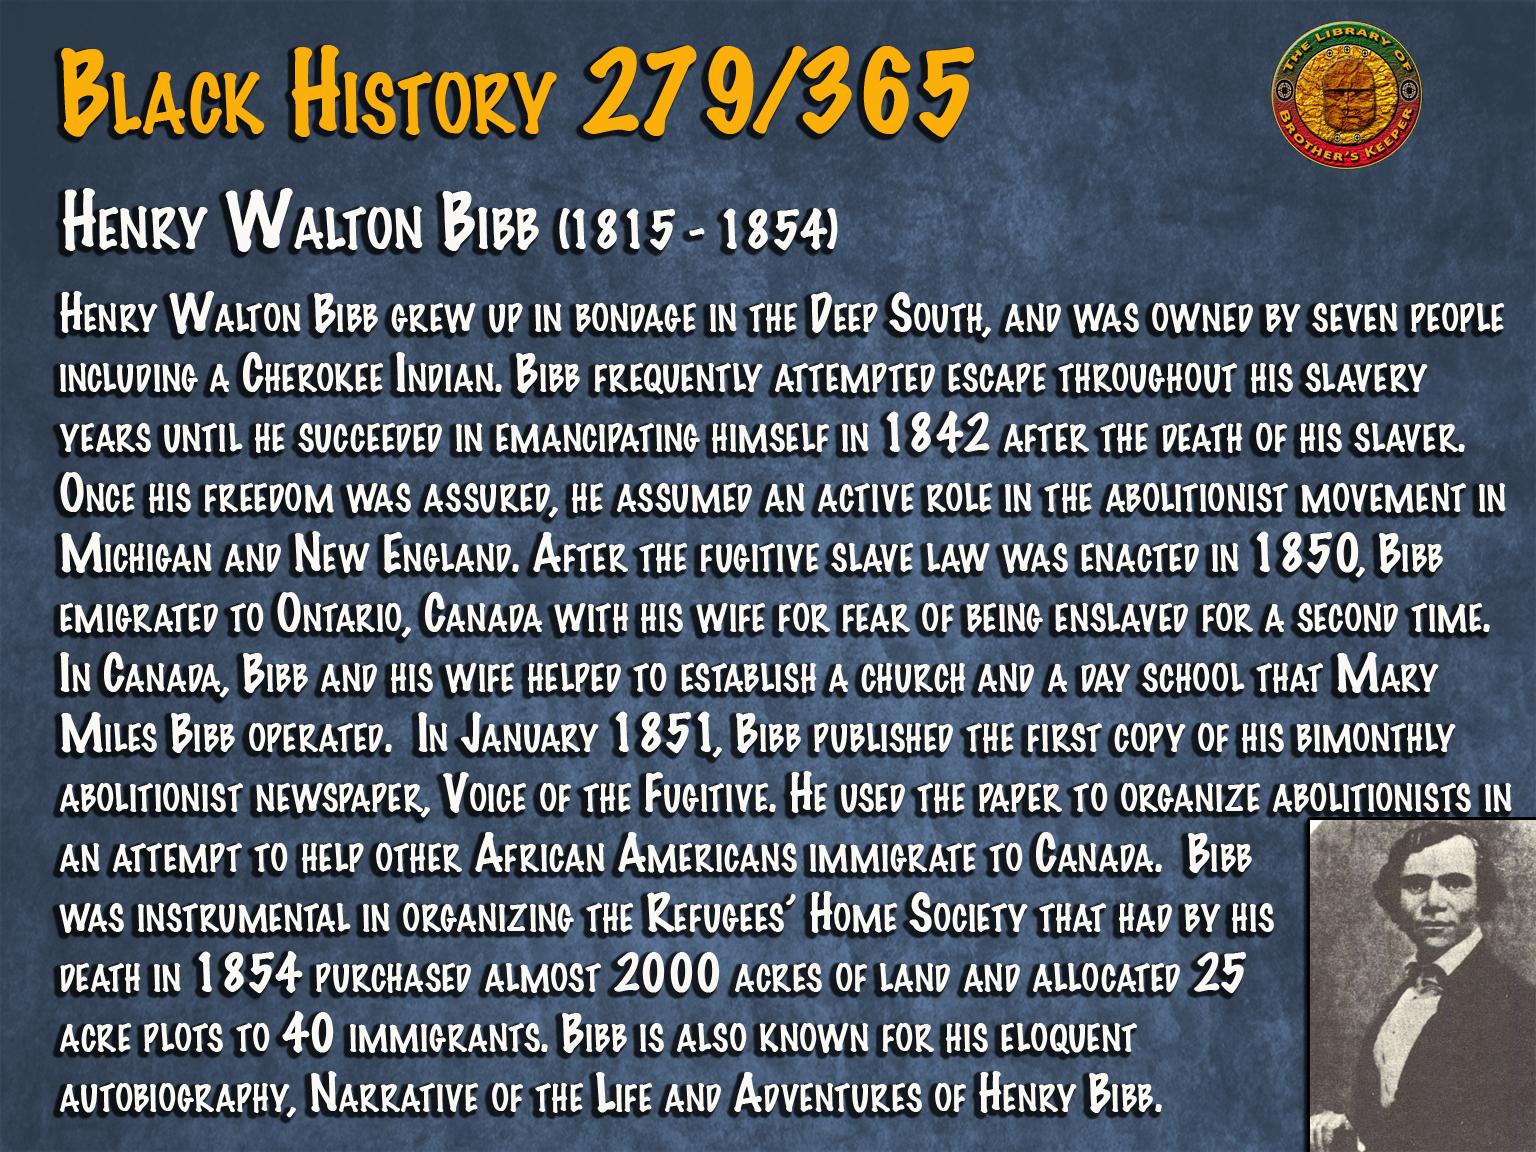 Henry Walton Bibb